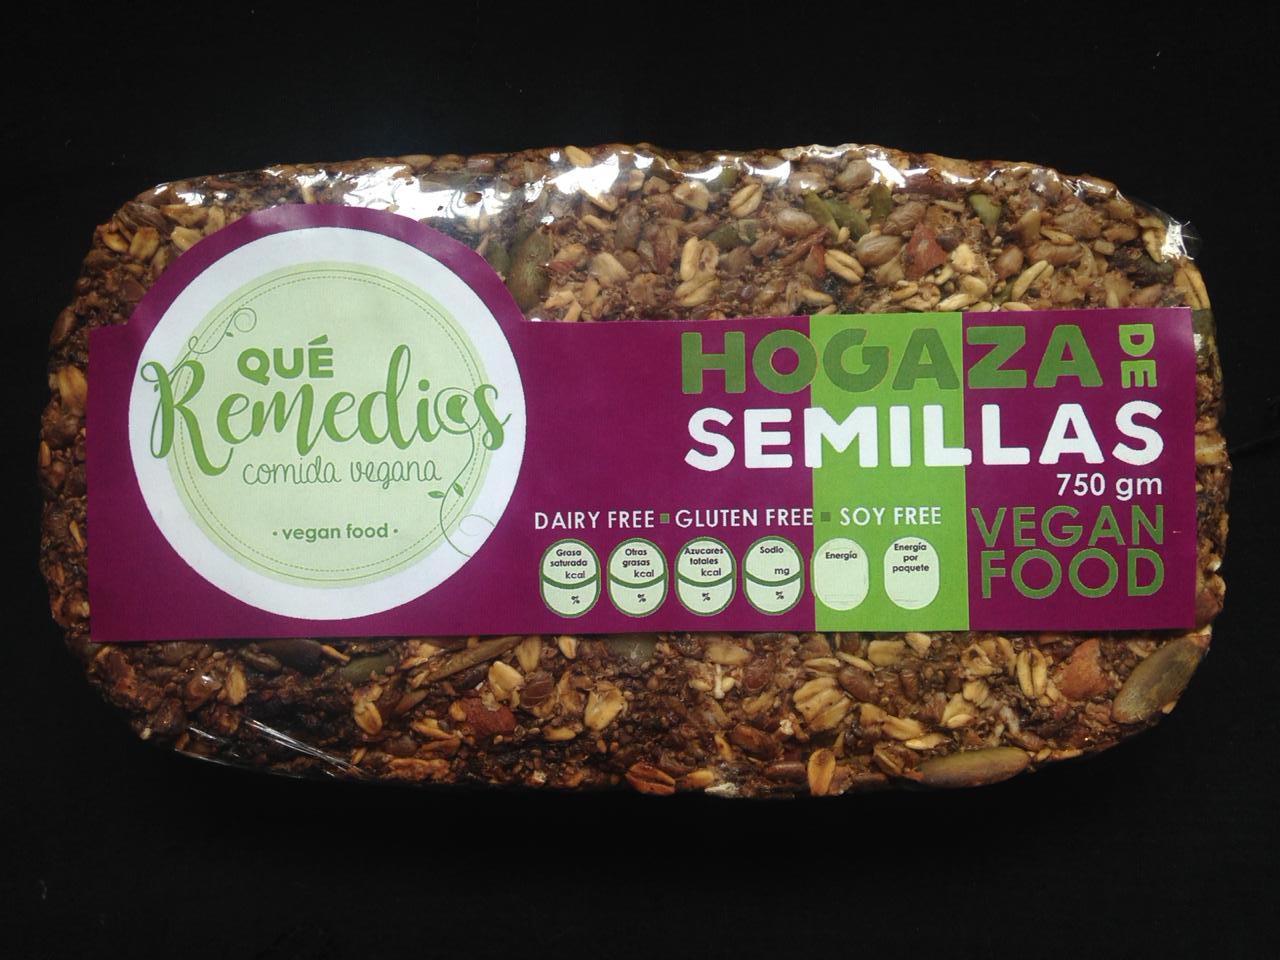 Hogaza_semillas